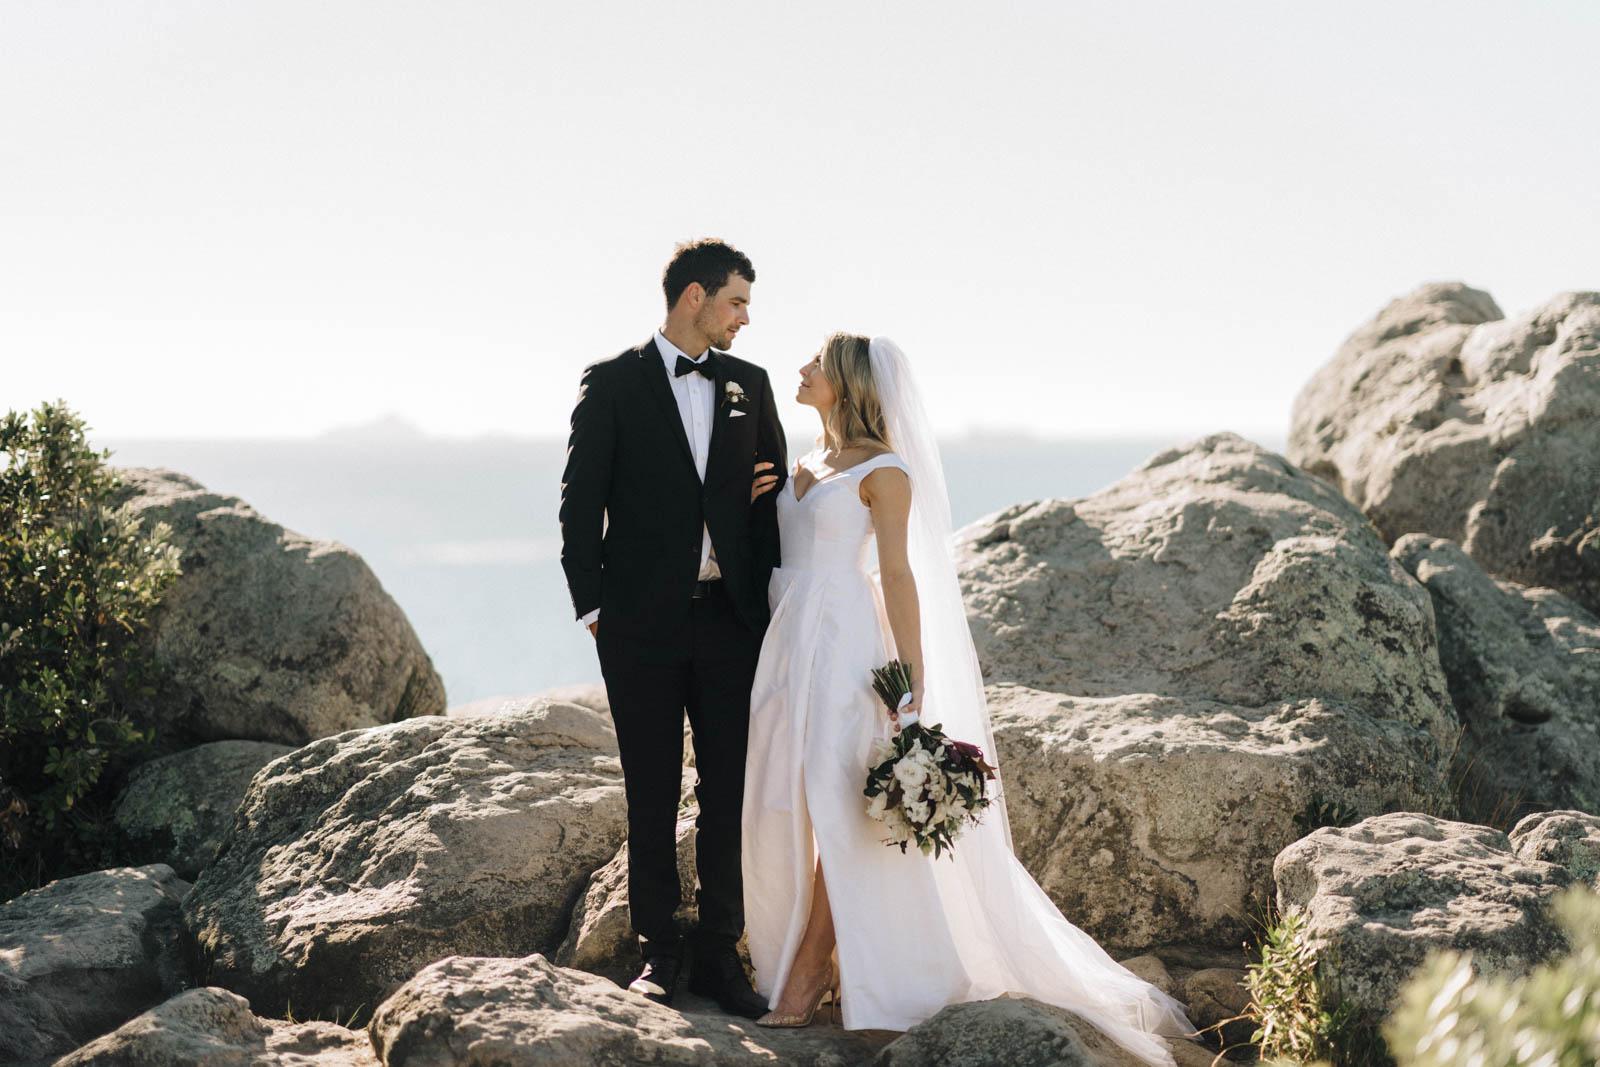 newfound-s-p-mt-maunganui-tauranga-wedding-photographer-1532-A9_05407-1